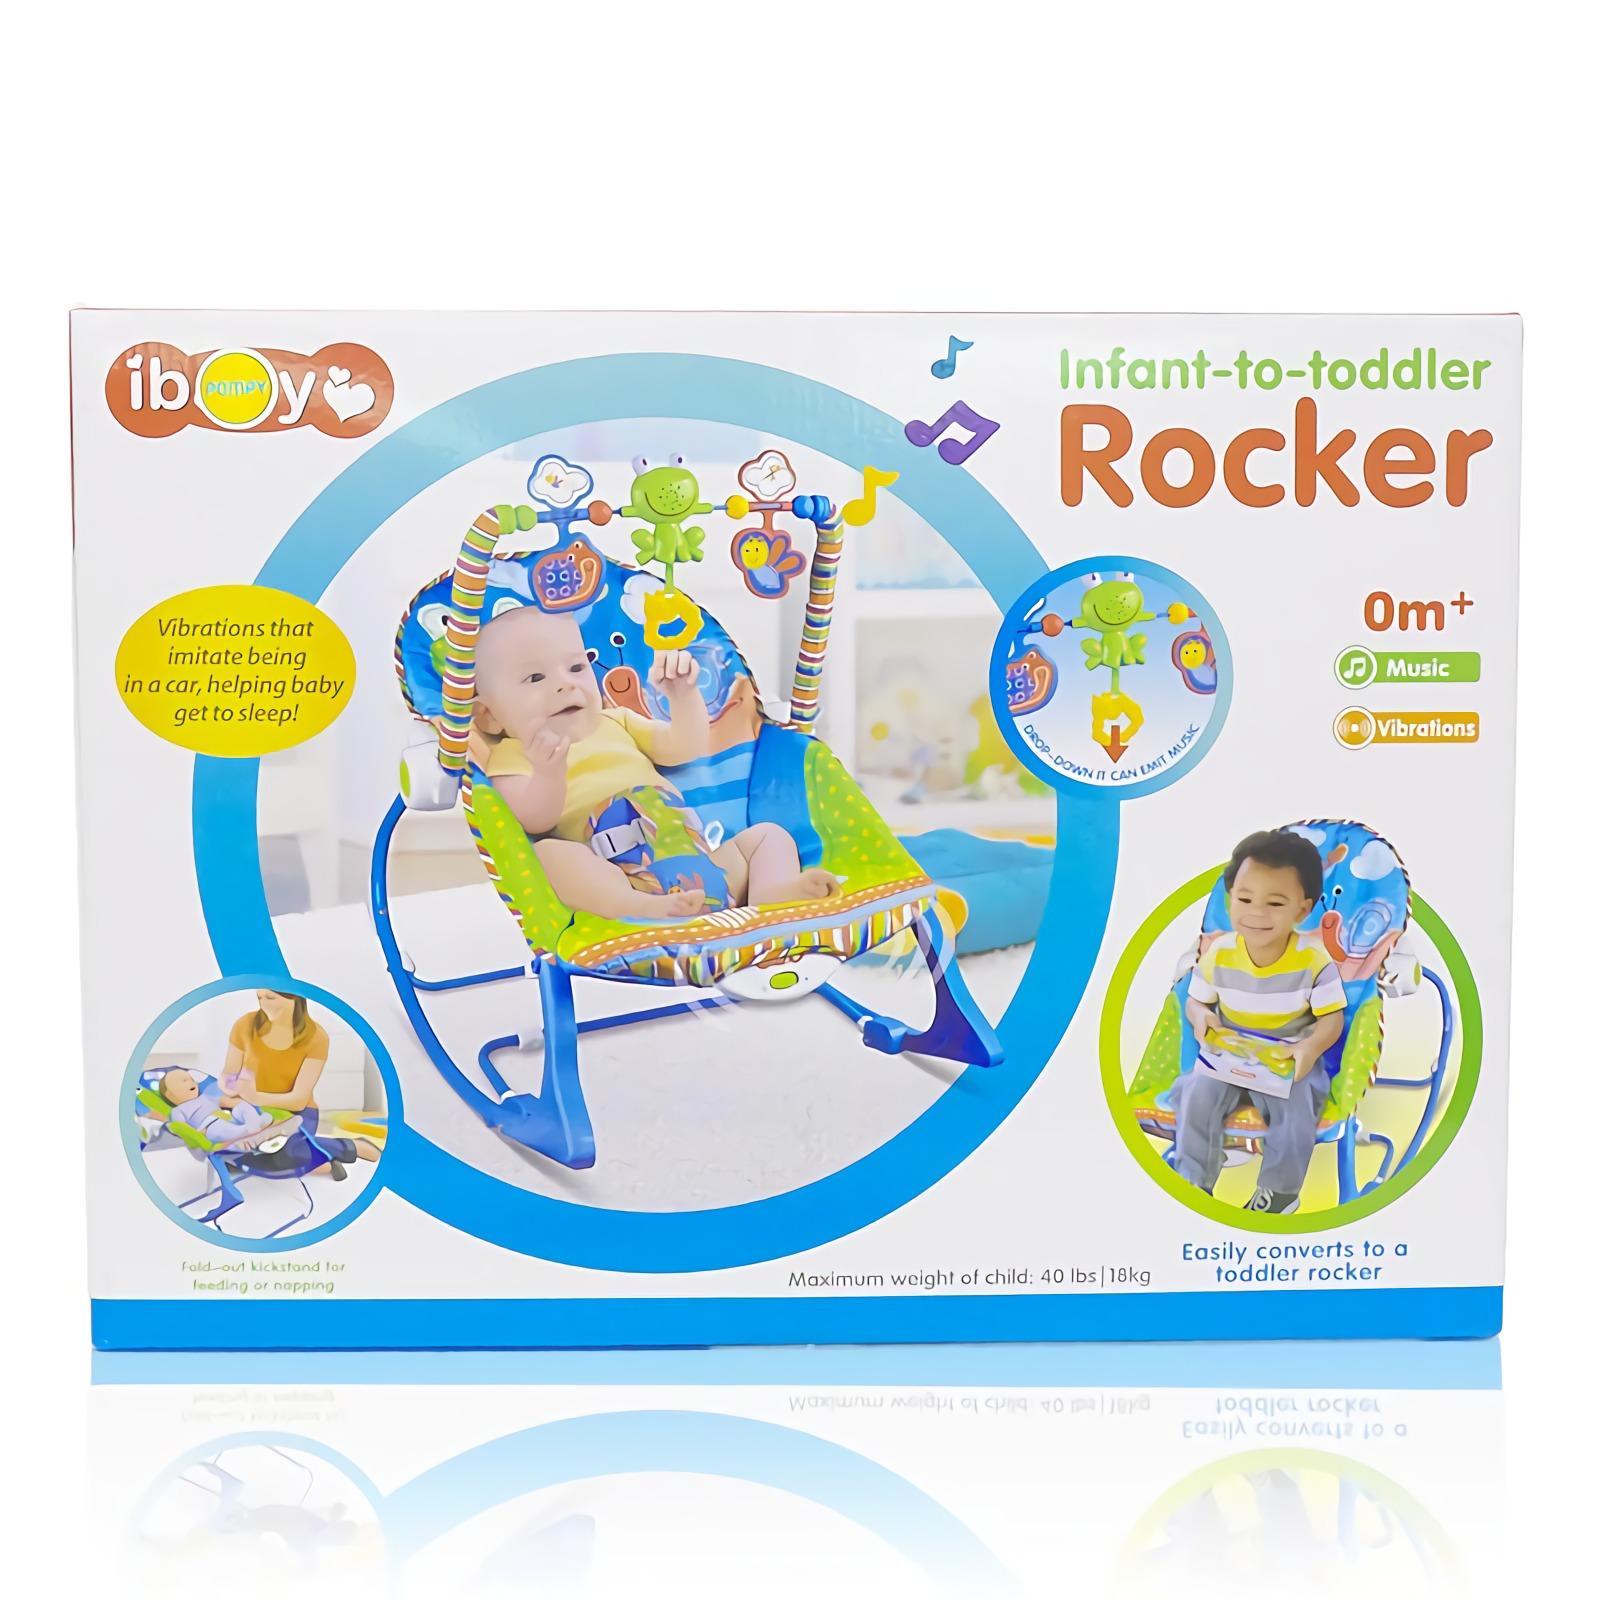 Fitur Sugar Baby Toys Deluxe Musical Vibration Bouncer Ayunan Pompy Bayi Pa 68110 0 5 Tahun Max 18